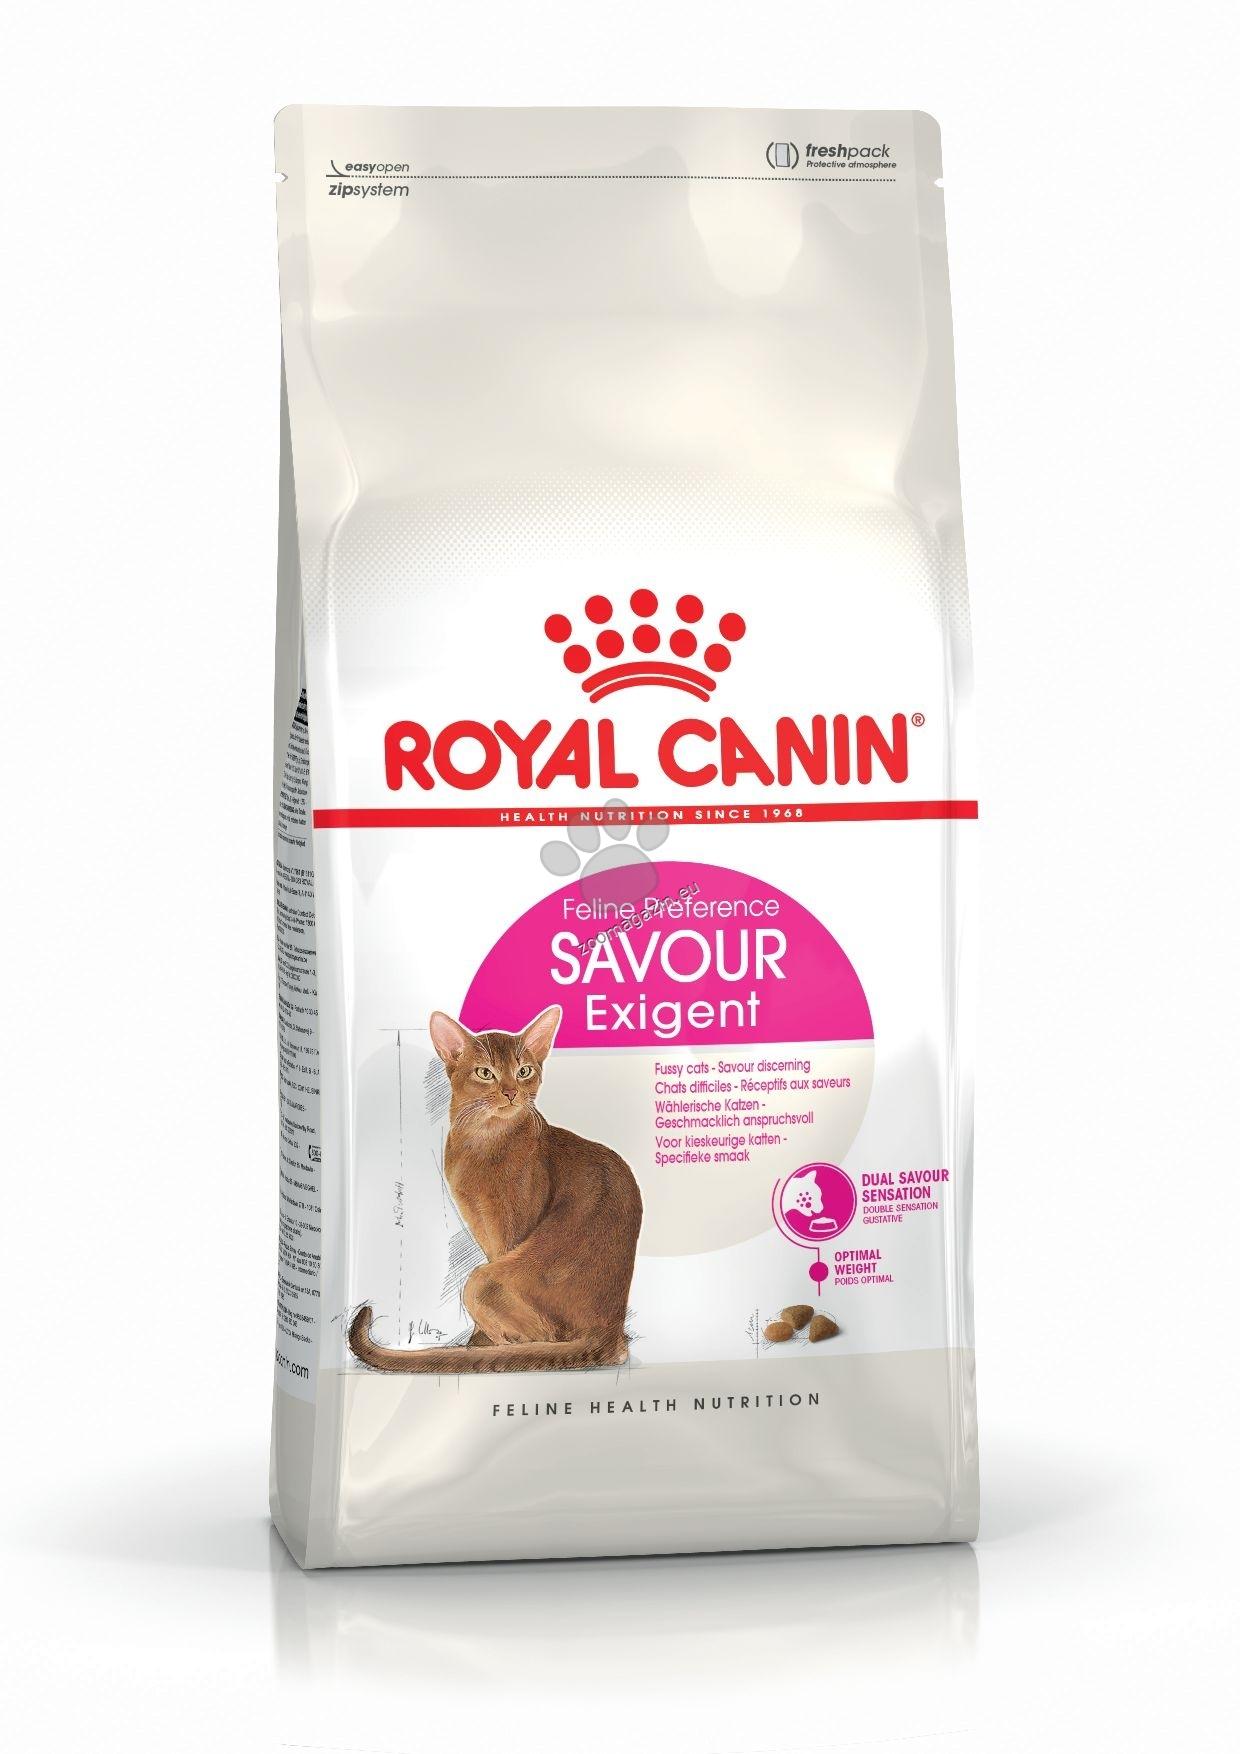 Royal Canin Exigent Savour - за много капризни котки  10 кг.